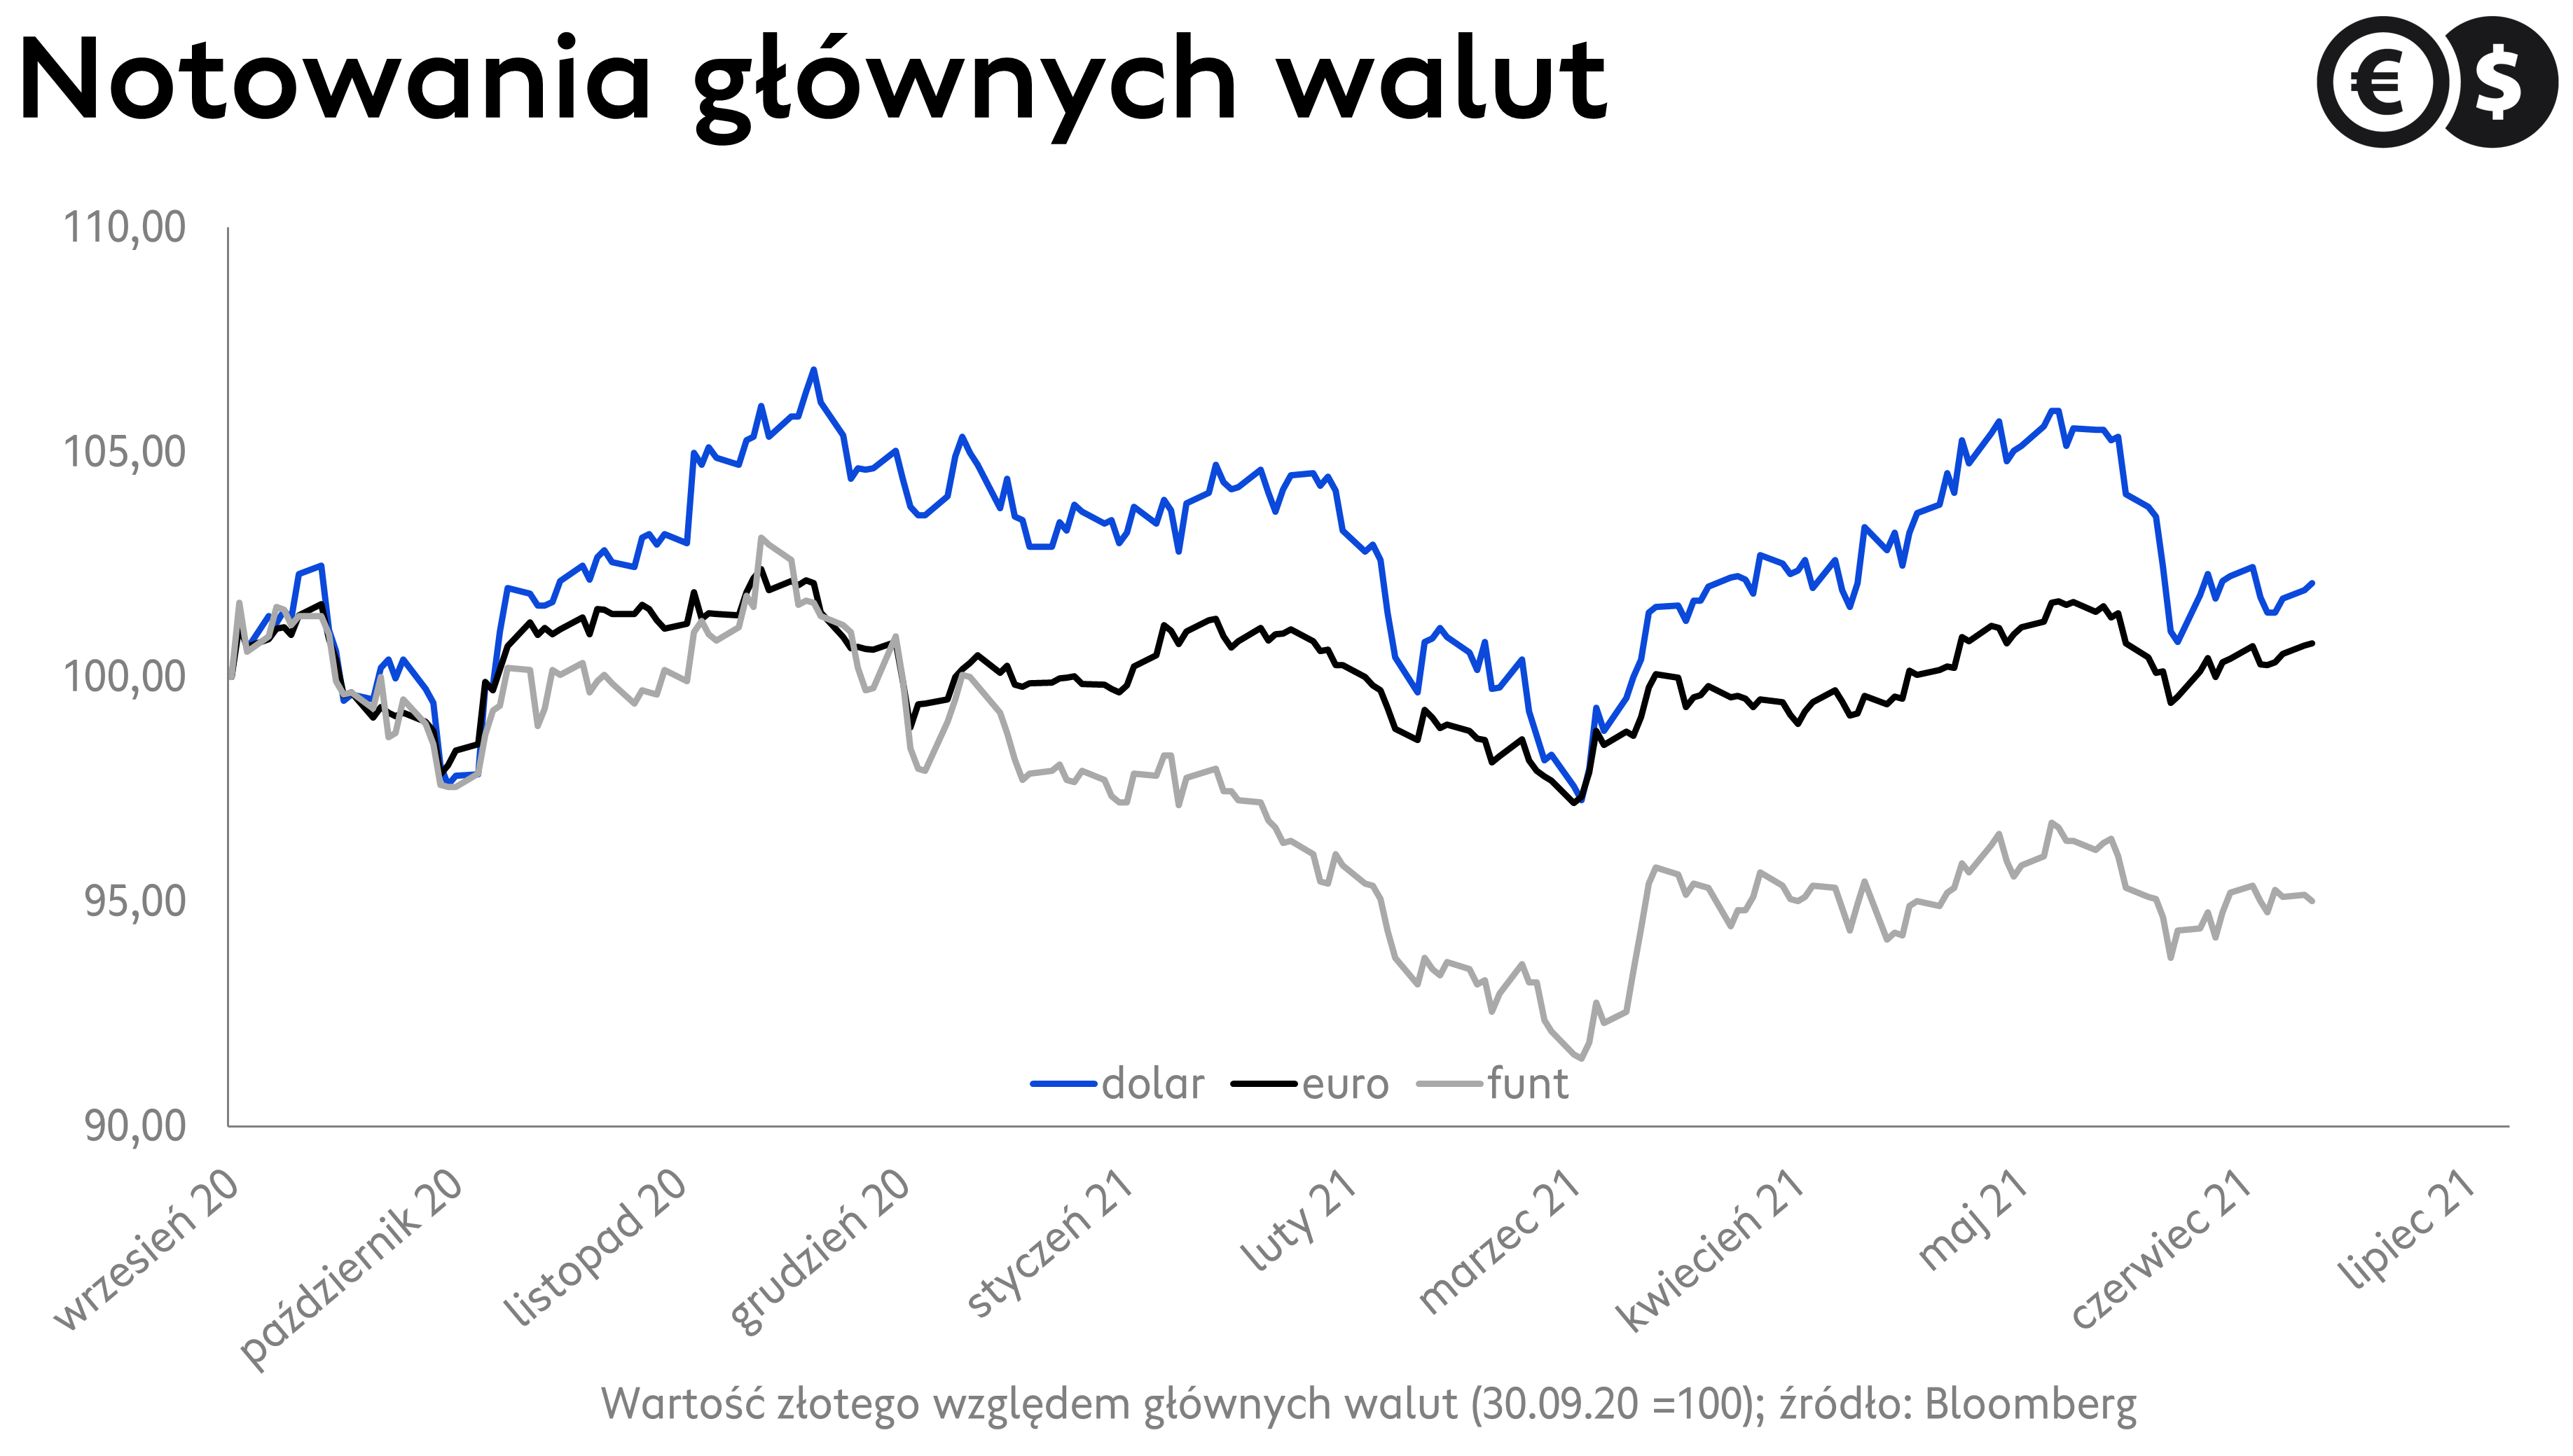 Kursy walut, EUR/PLN, USD/PLN i GBP/PLN; źródło: Bloomberg